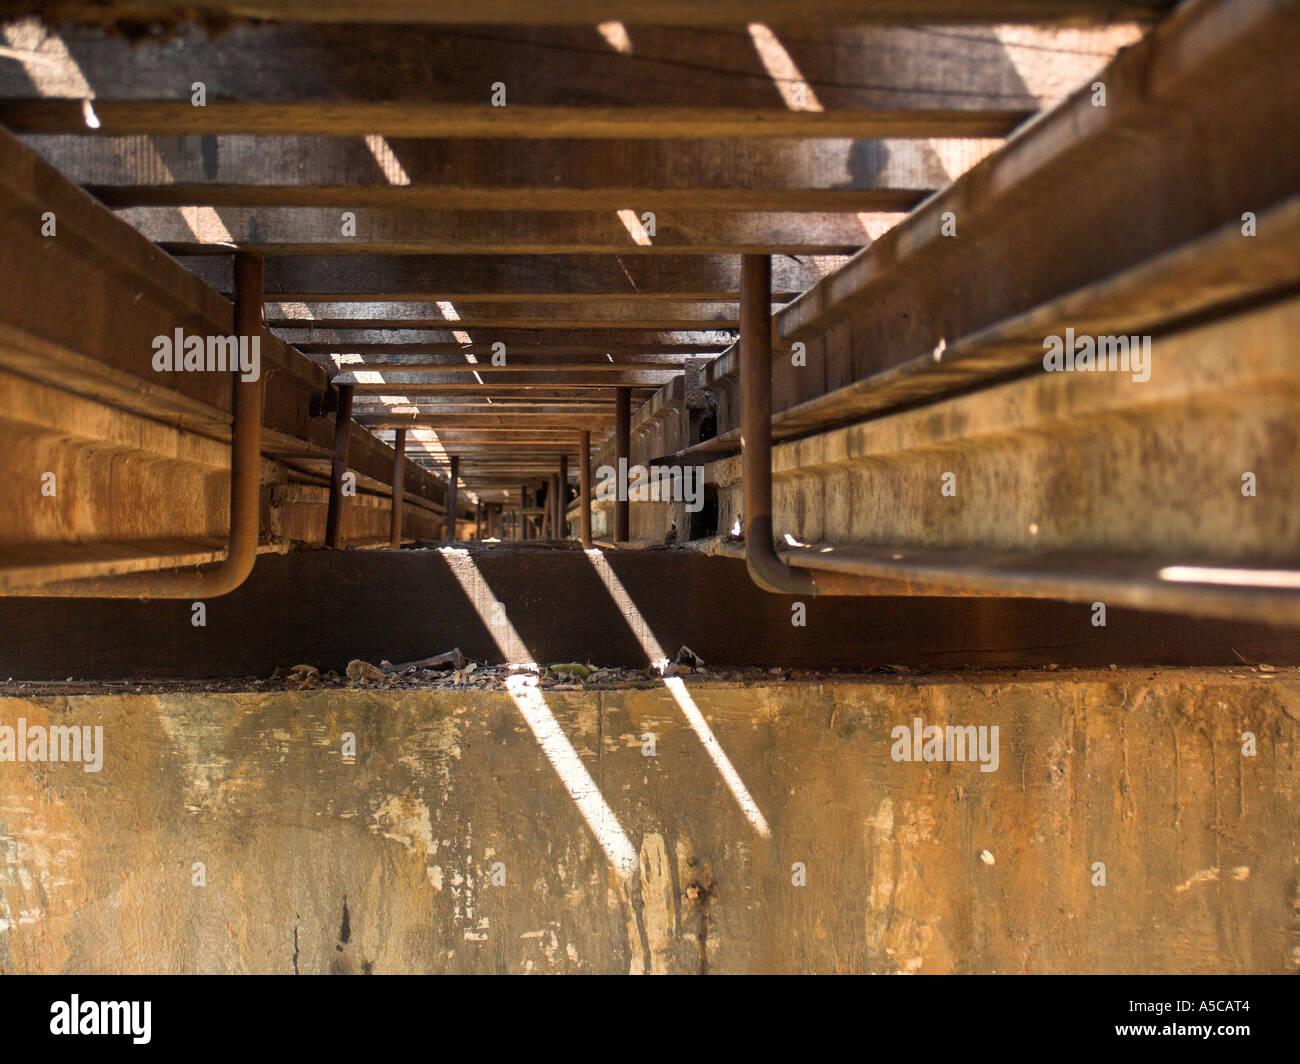 Construction detail from beneath Krasae Cave trestle railway viaduct bridge Burma Railway Thailand - Stock Image